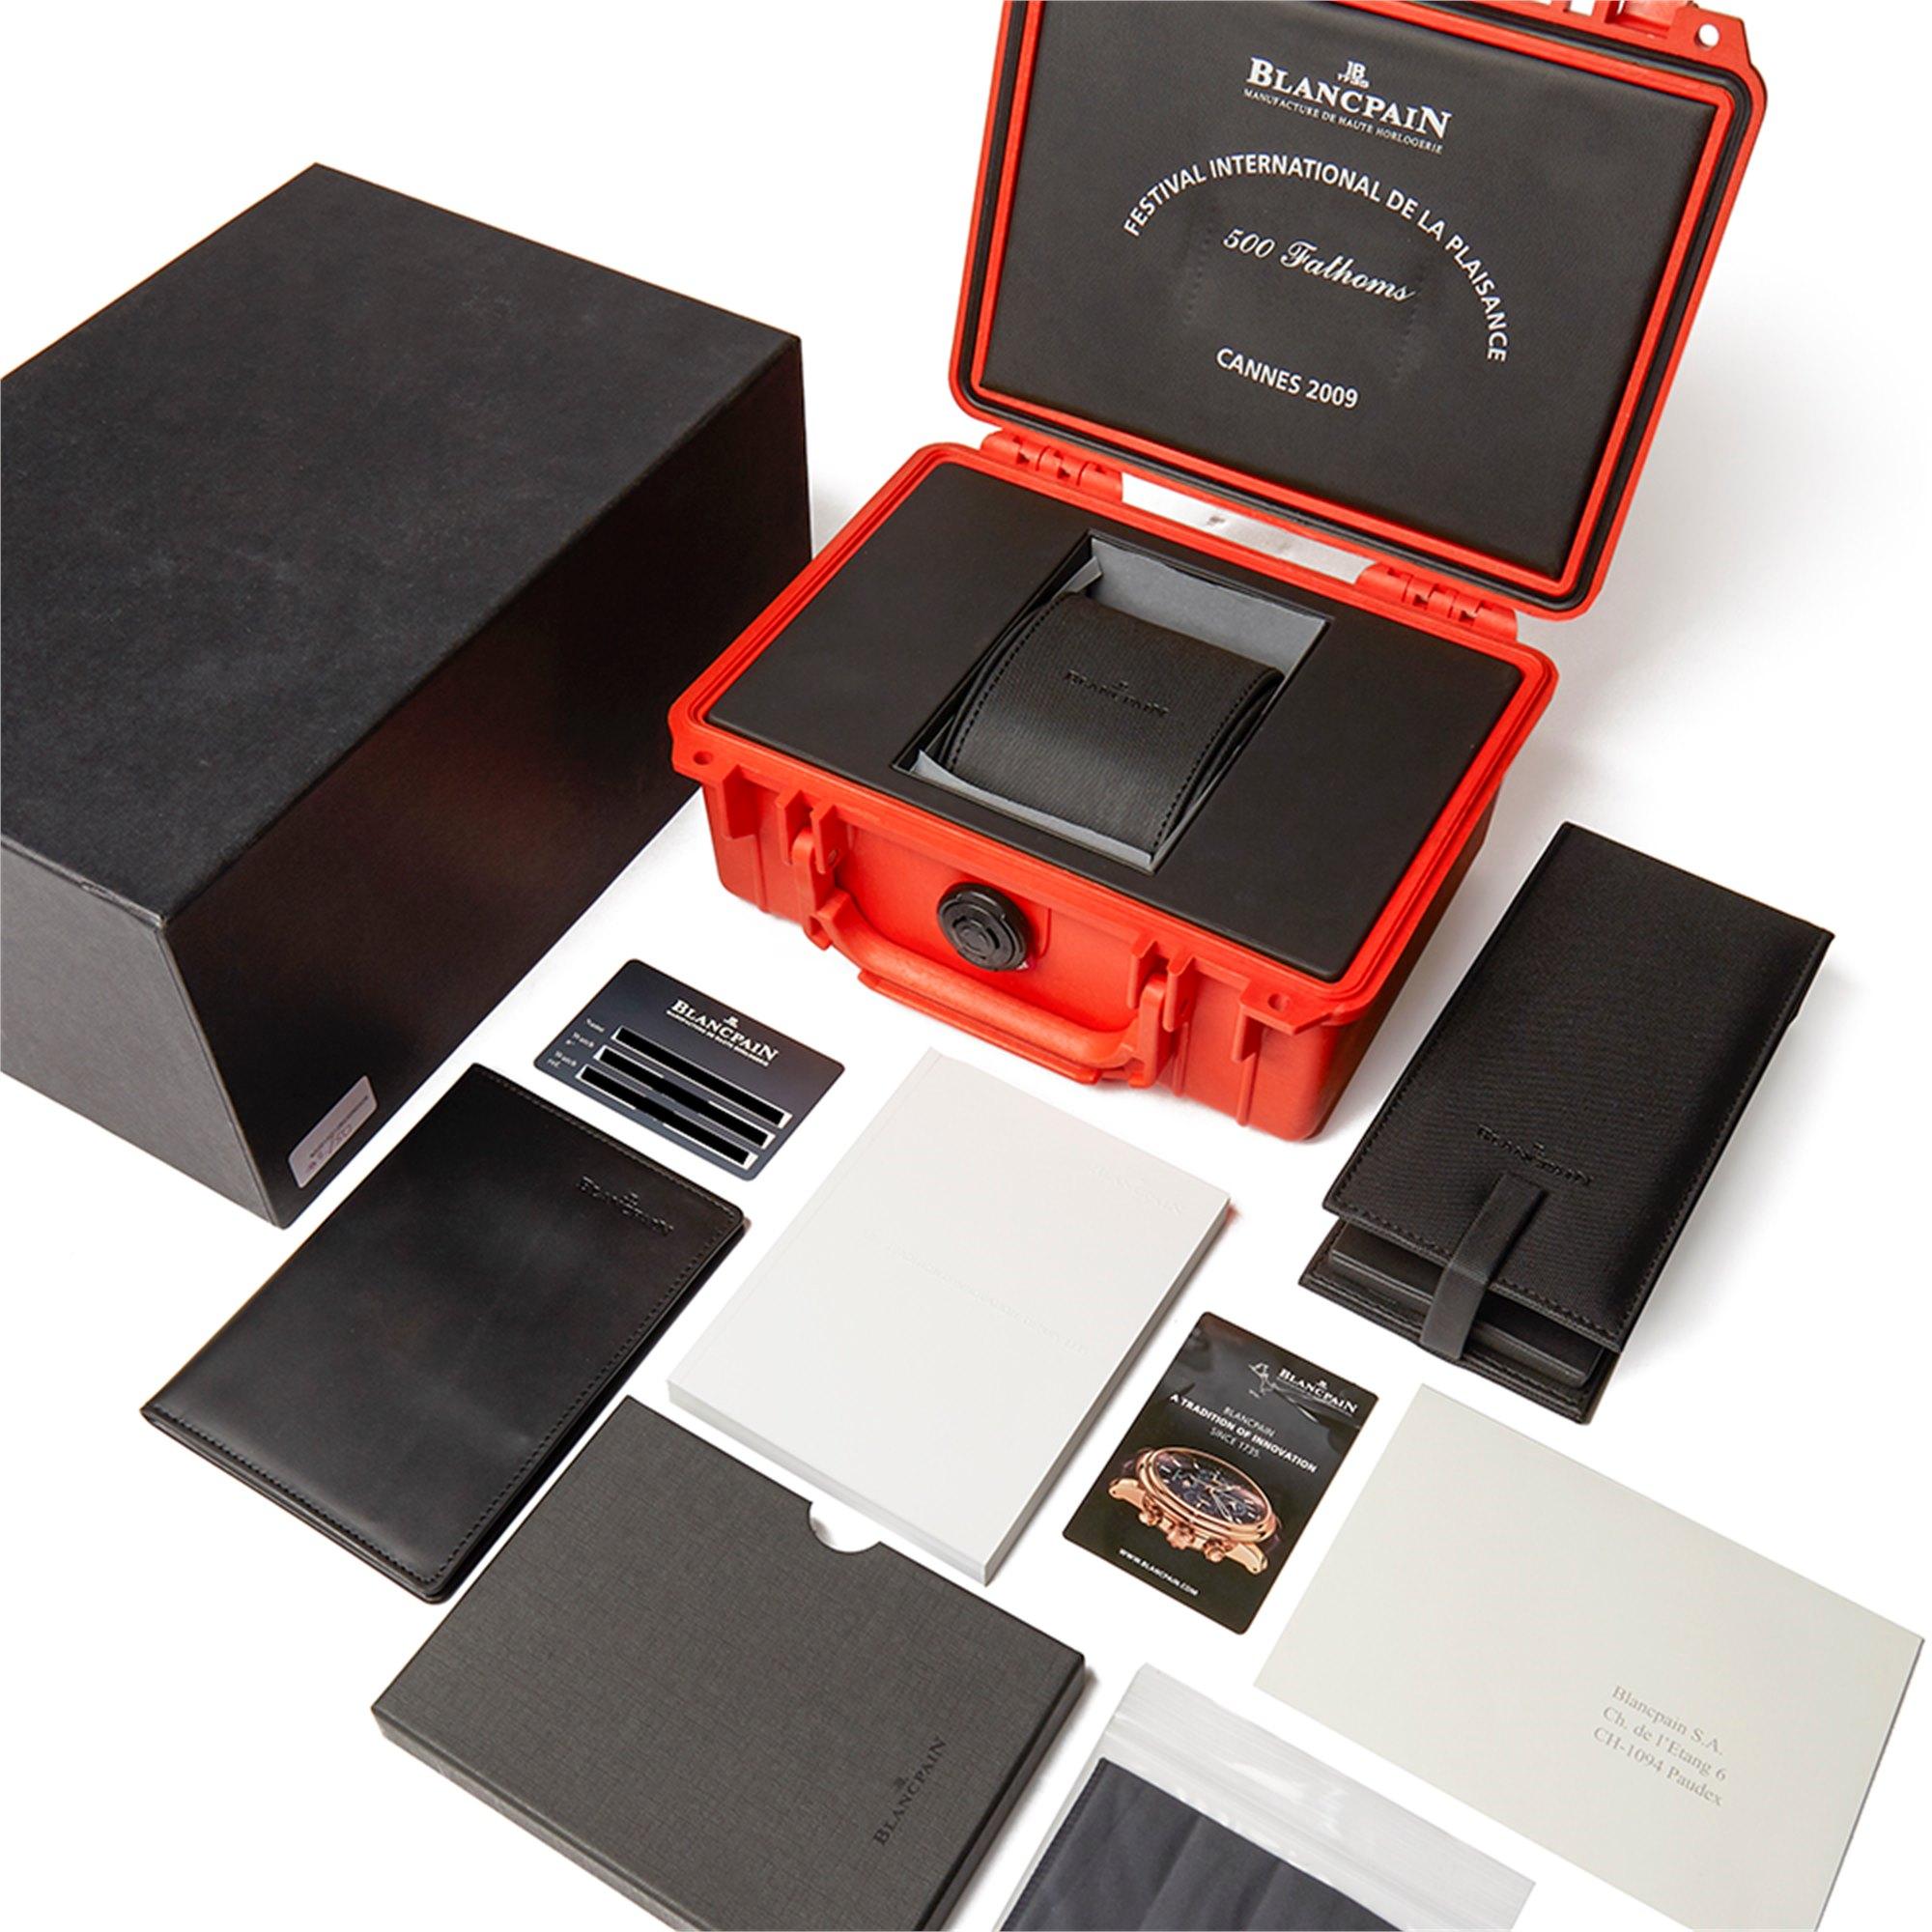 Blancpain Fifty Fathoms 500 Fathoms Limited Edition 02/50 Titanium 50015-12b34-52b